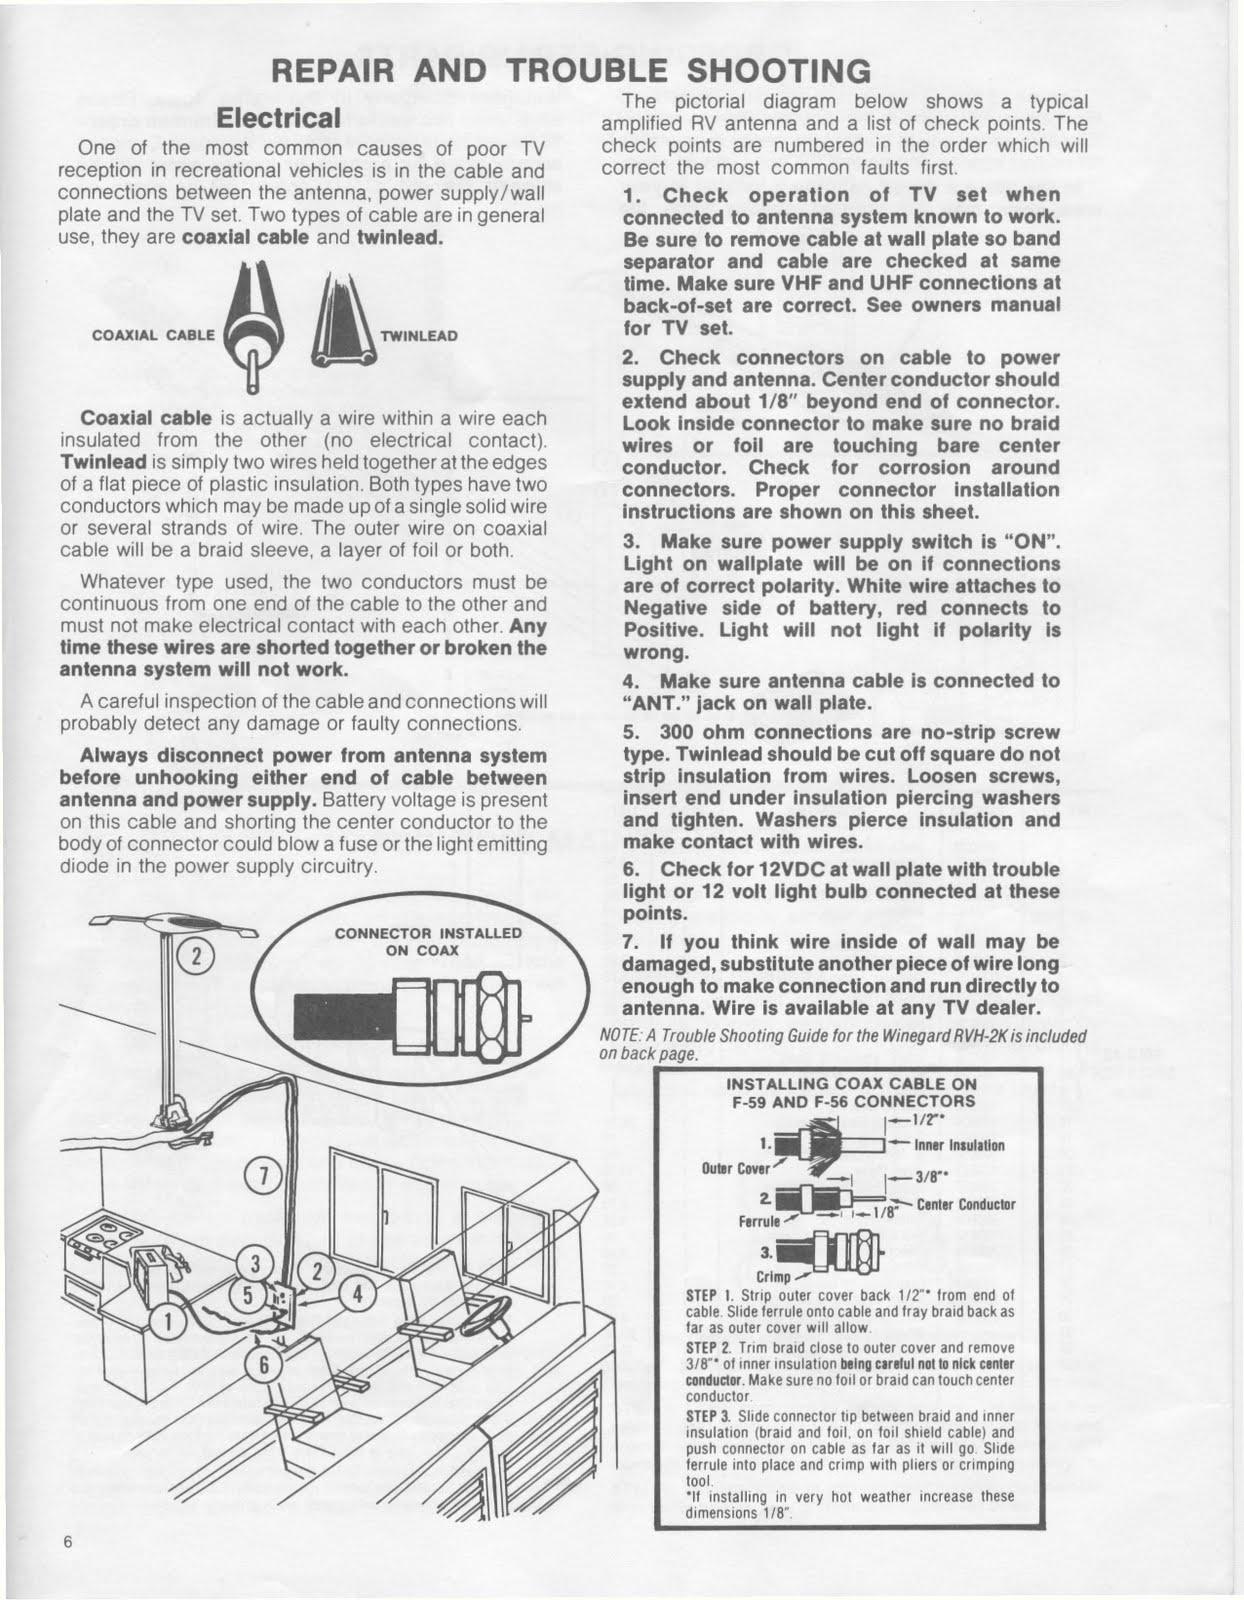 Camper Wiring Diagram Manual : Winegard rv satellite wiring diagrams get free image